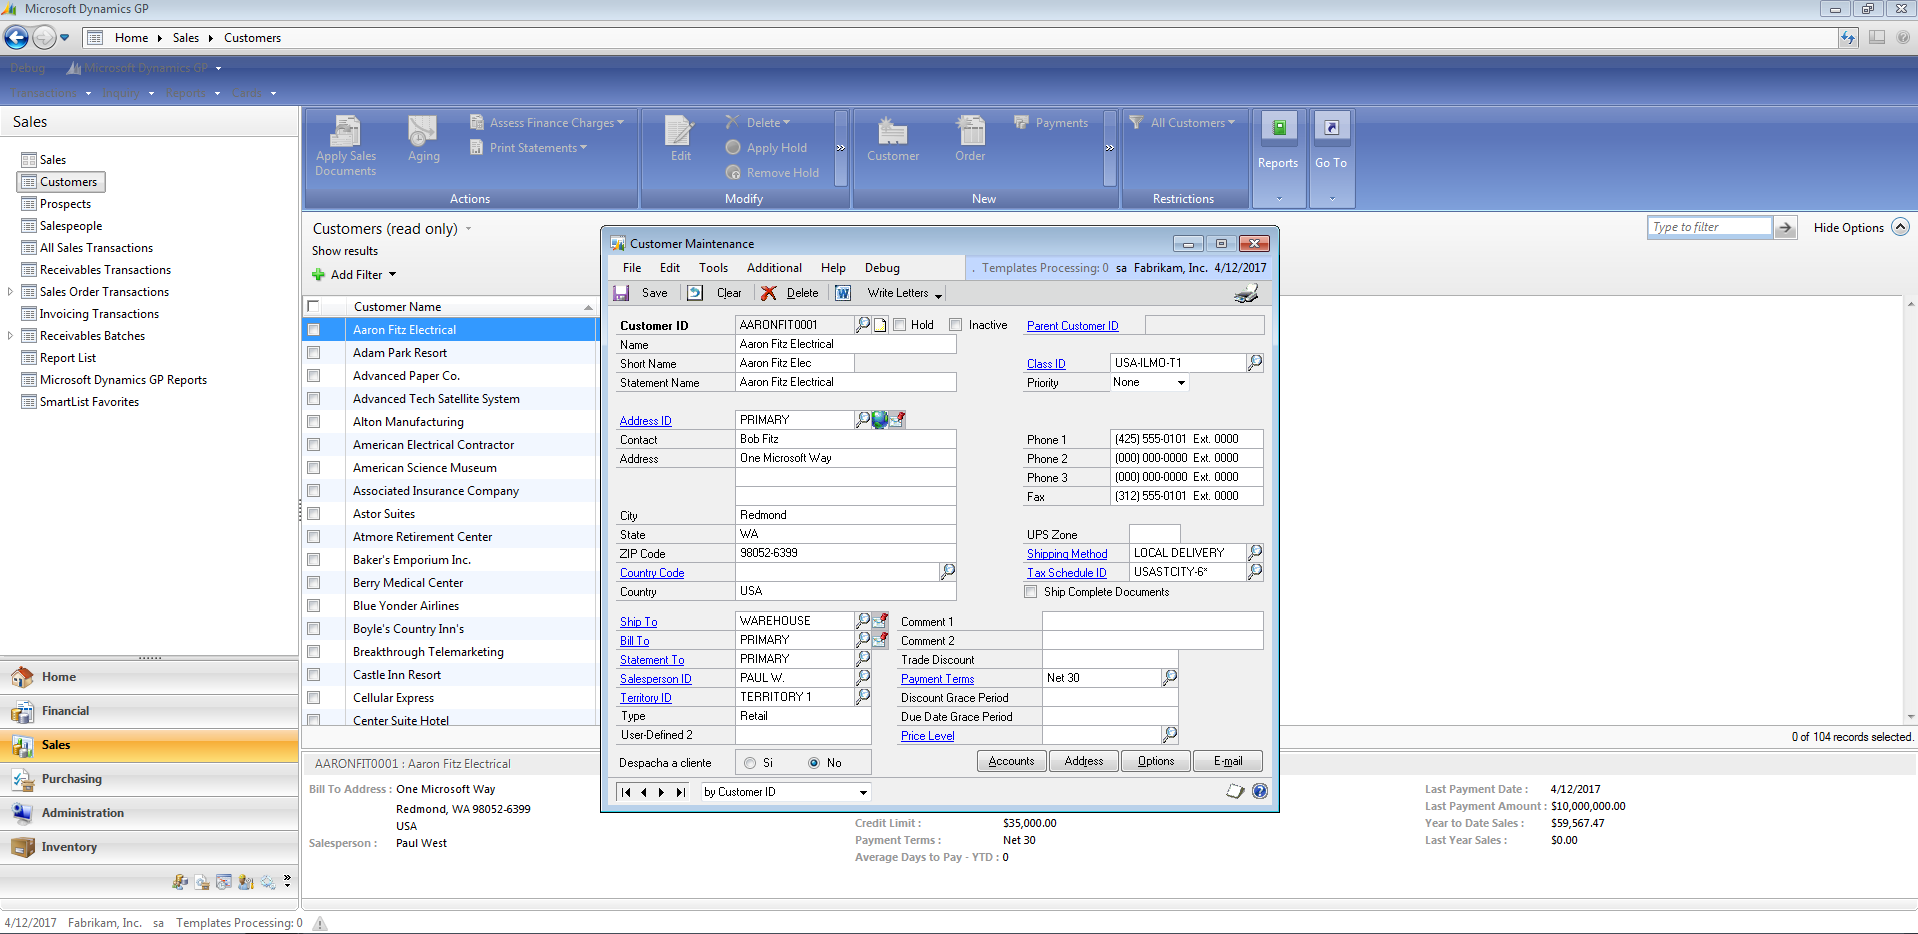 Cliente Desktop